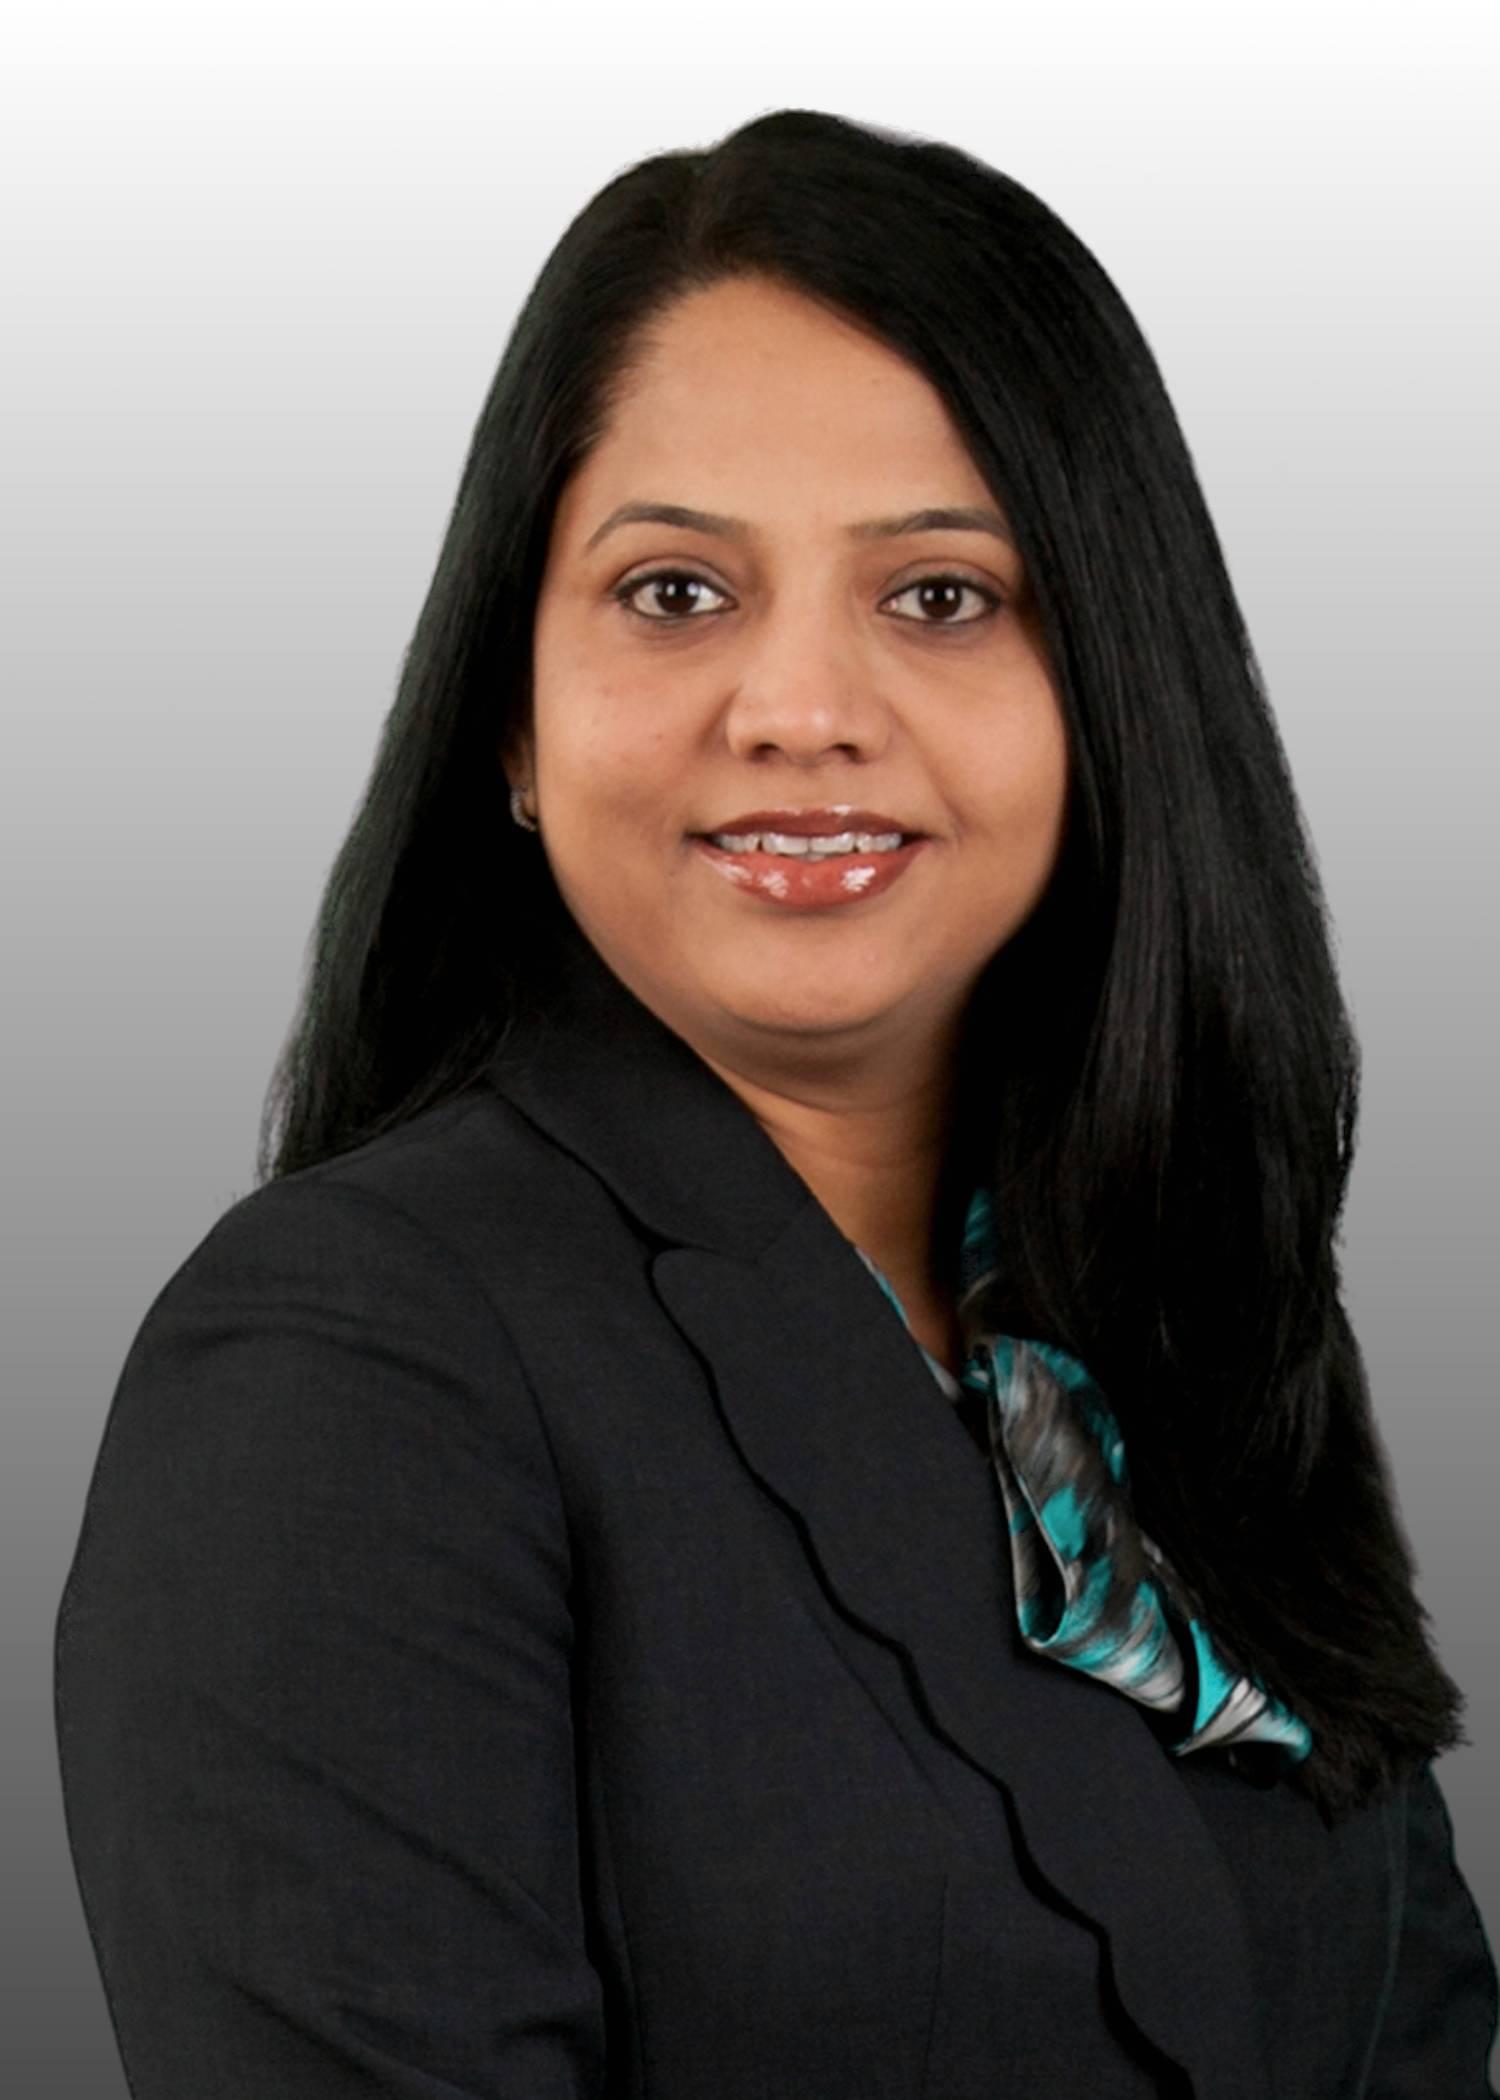 Dr. Sasikala Chittimireddy